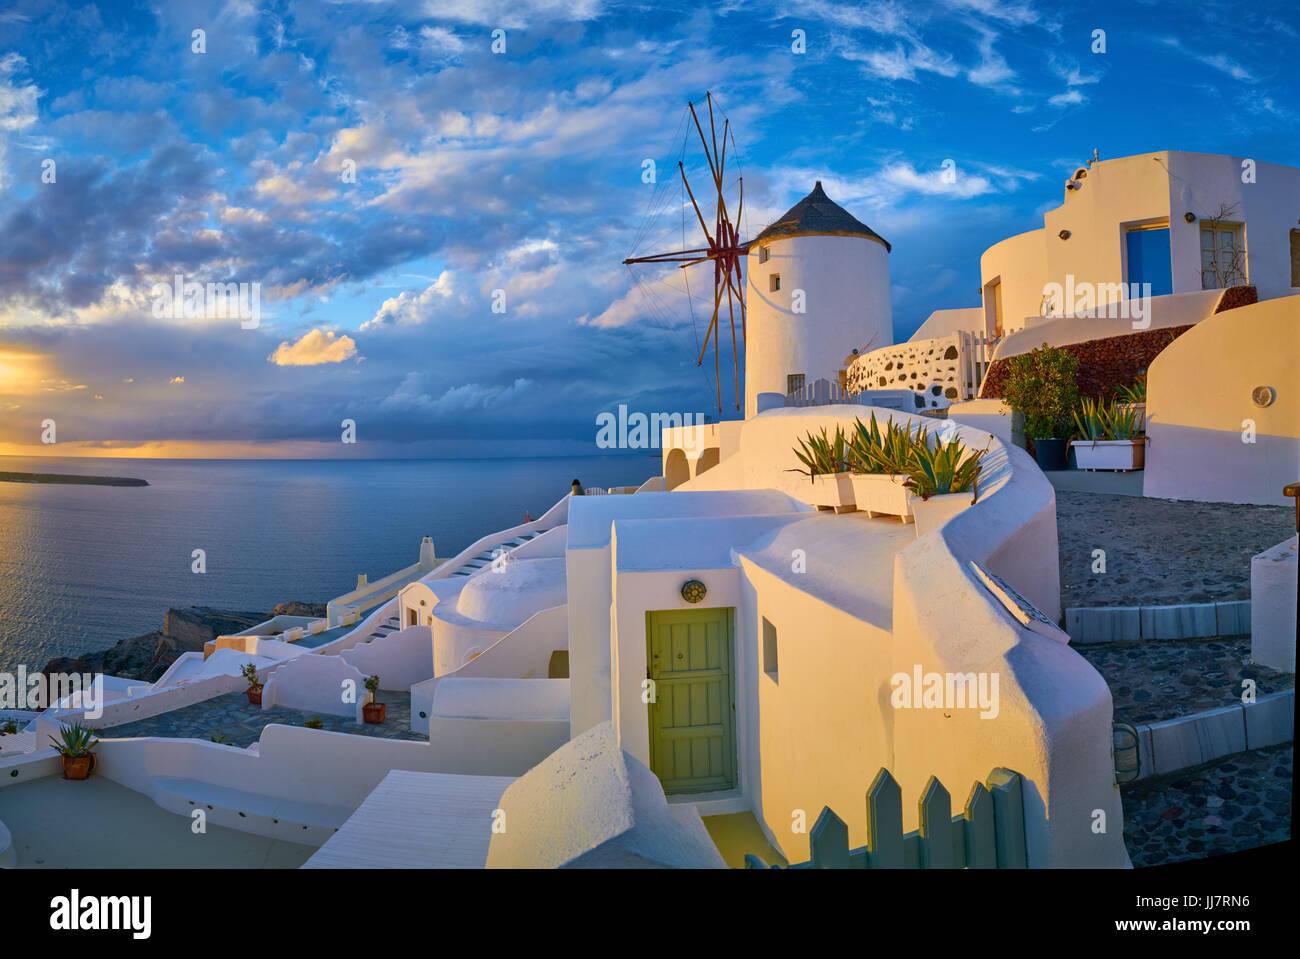 Windmühle im Dorf Oia bei Sonnenuntergang, Santorini, Griechenland Stockbild